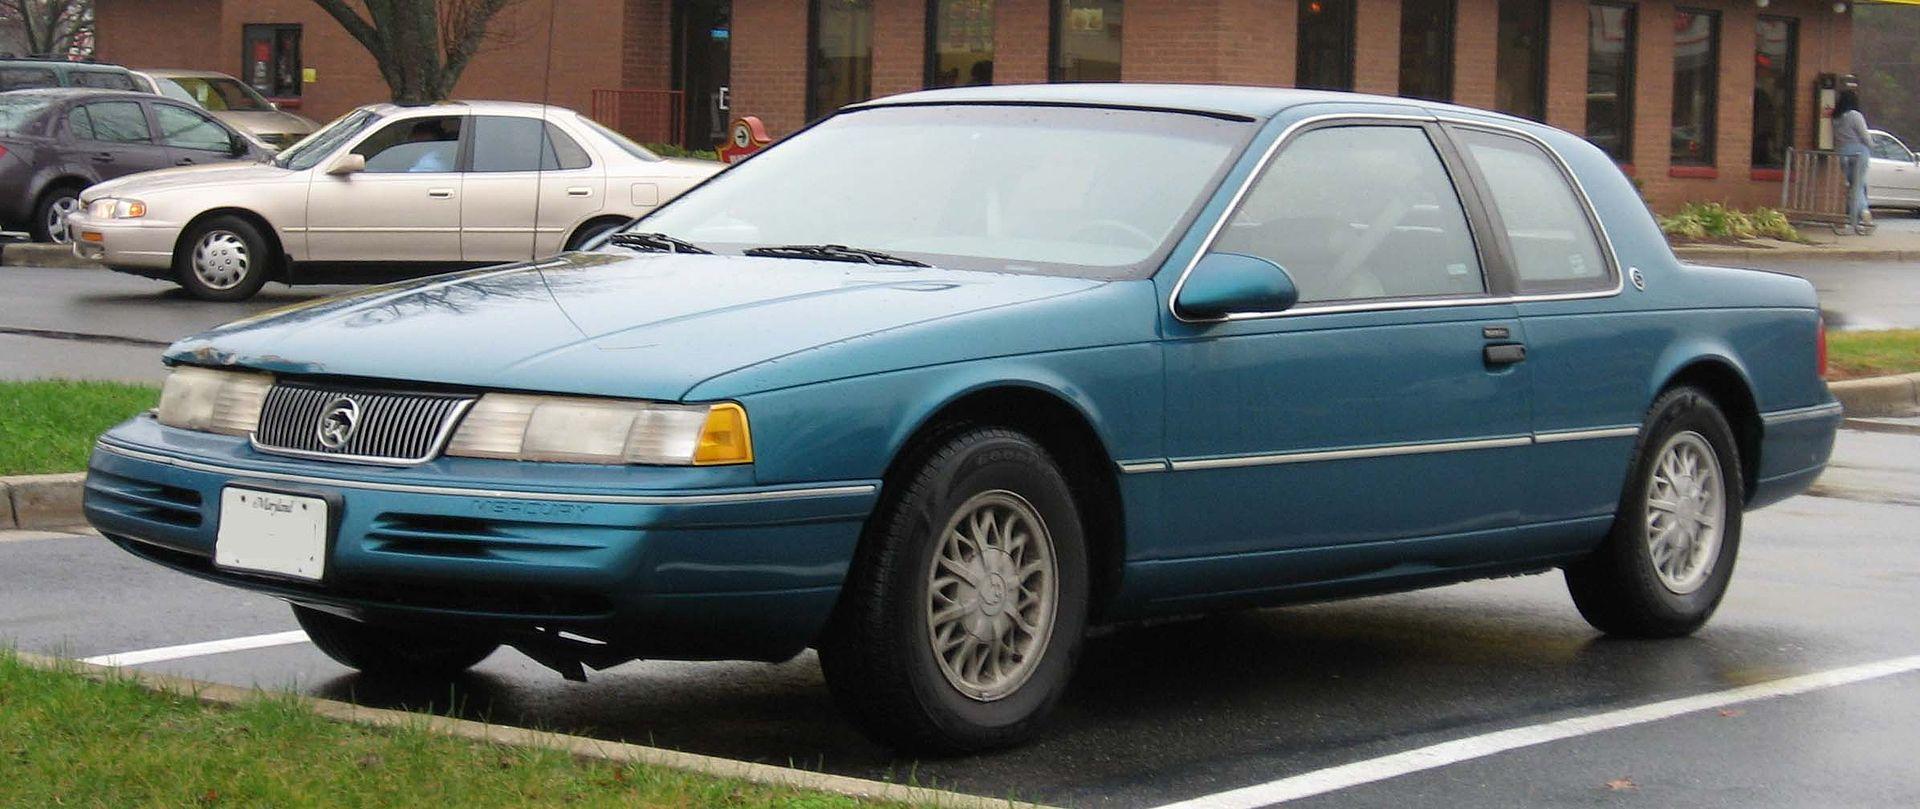 OBX Ceramic Cat Fits 99 To 00 Ford Contour 1999 Mercury Cougar 2.5L V6 Duratec